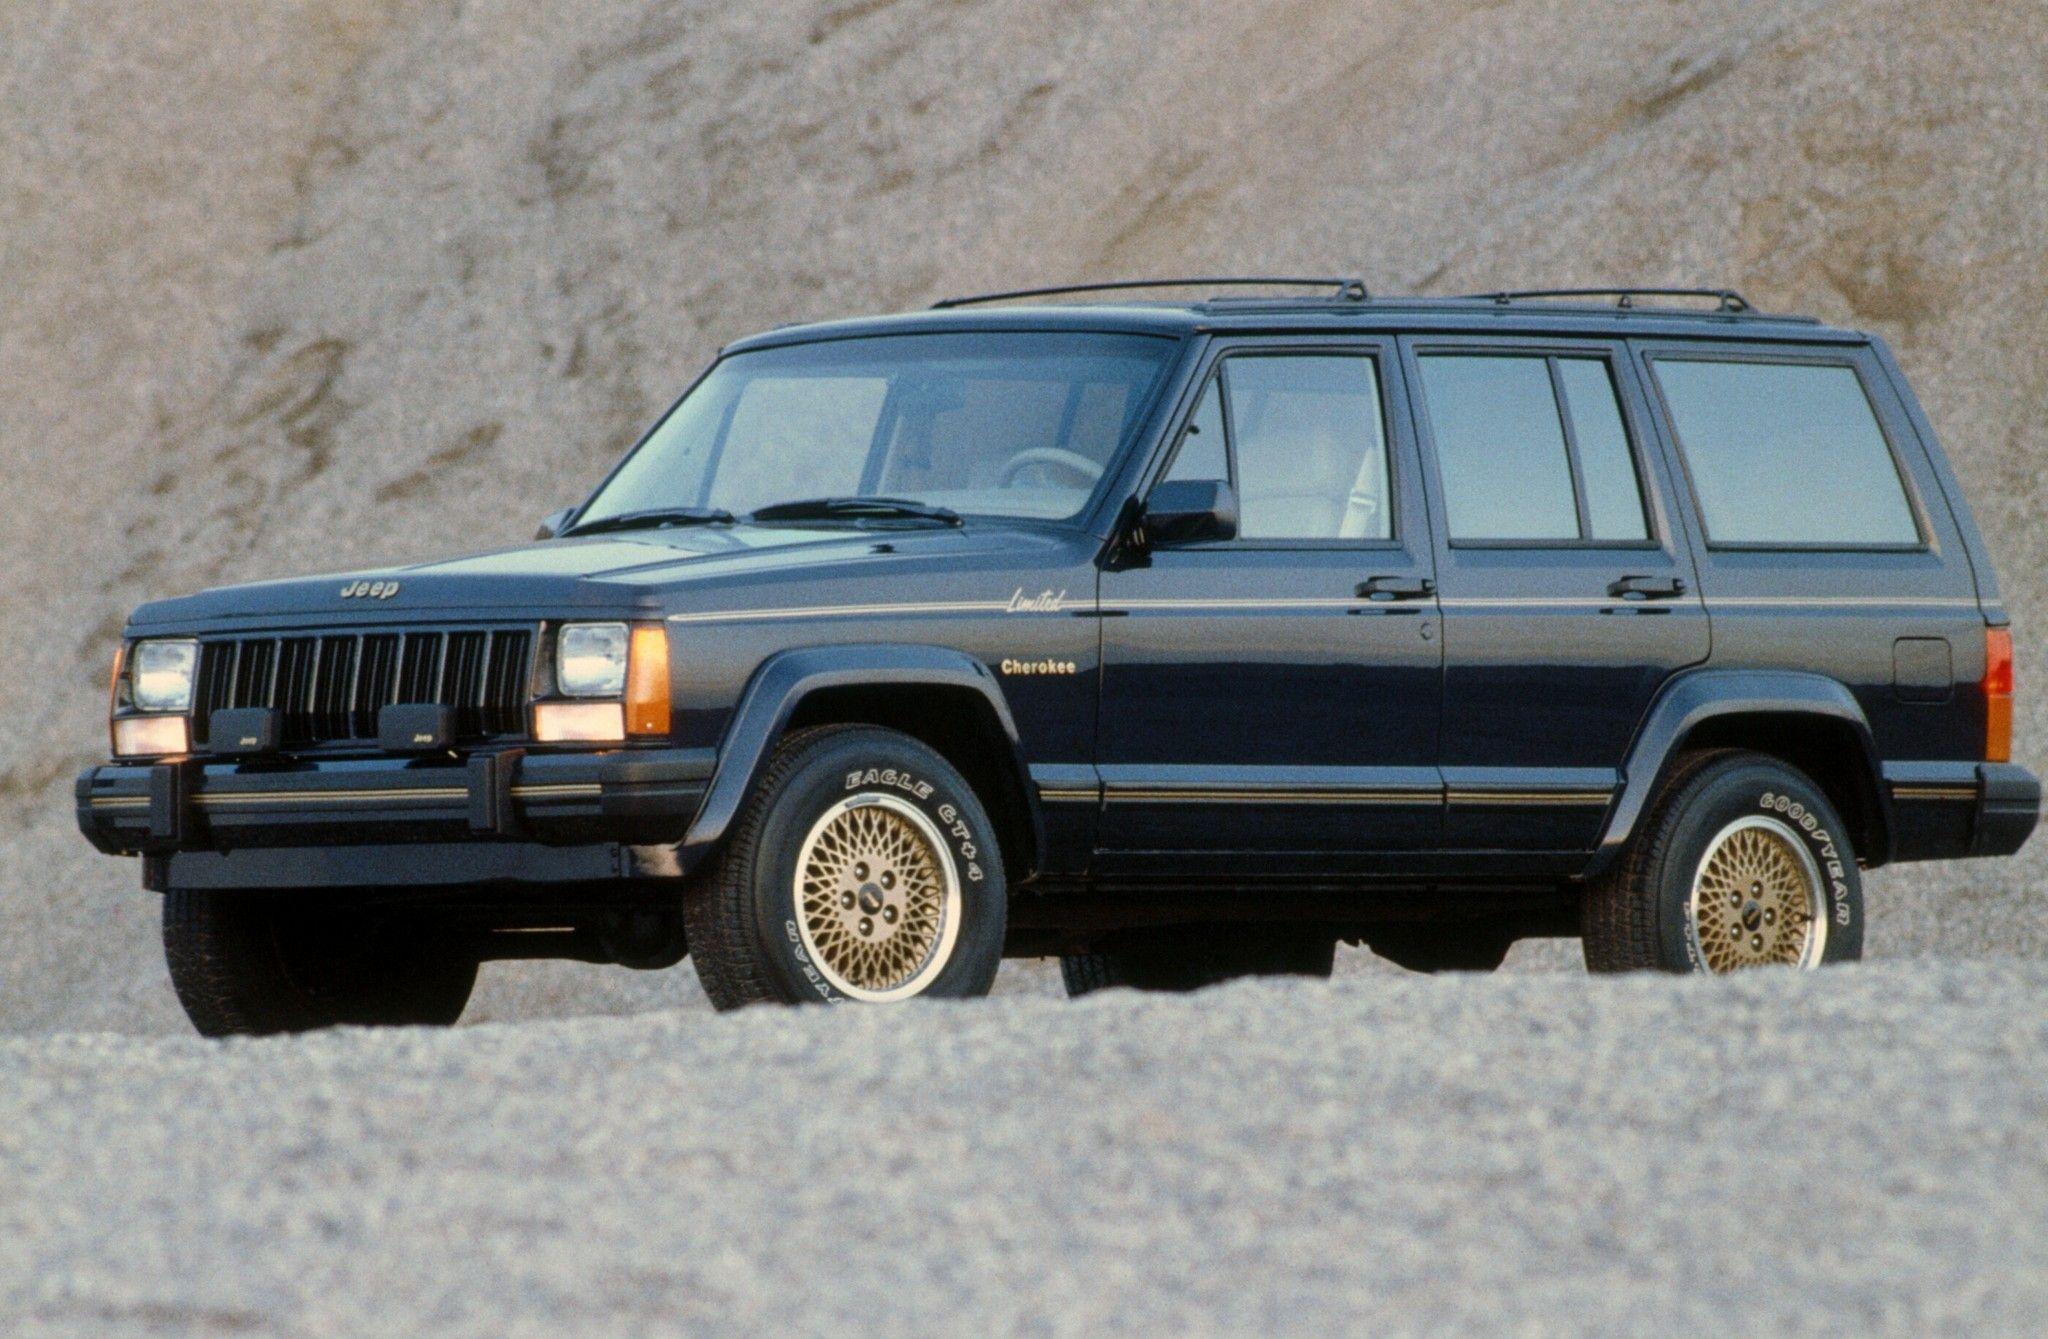 1990 Jeep Cherokee Limited Xj Jeep Cherokee Xj Jeep Cherokee Limited Jeep Cherokee